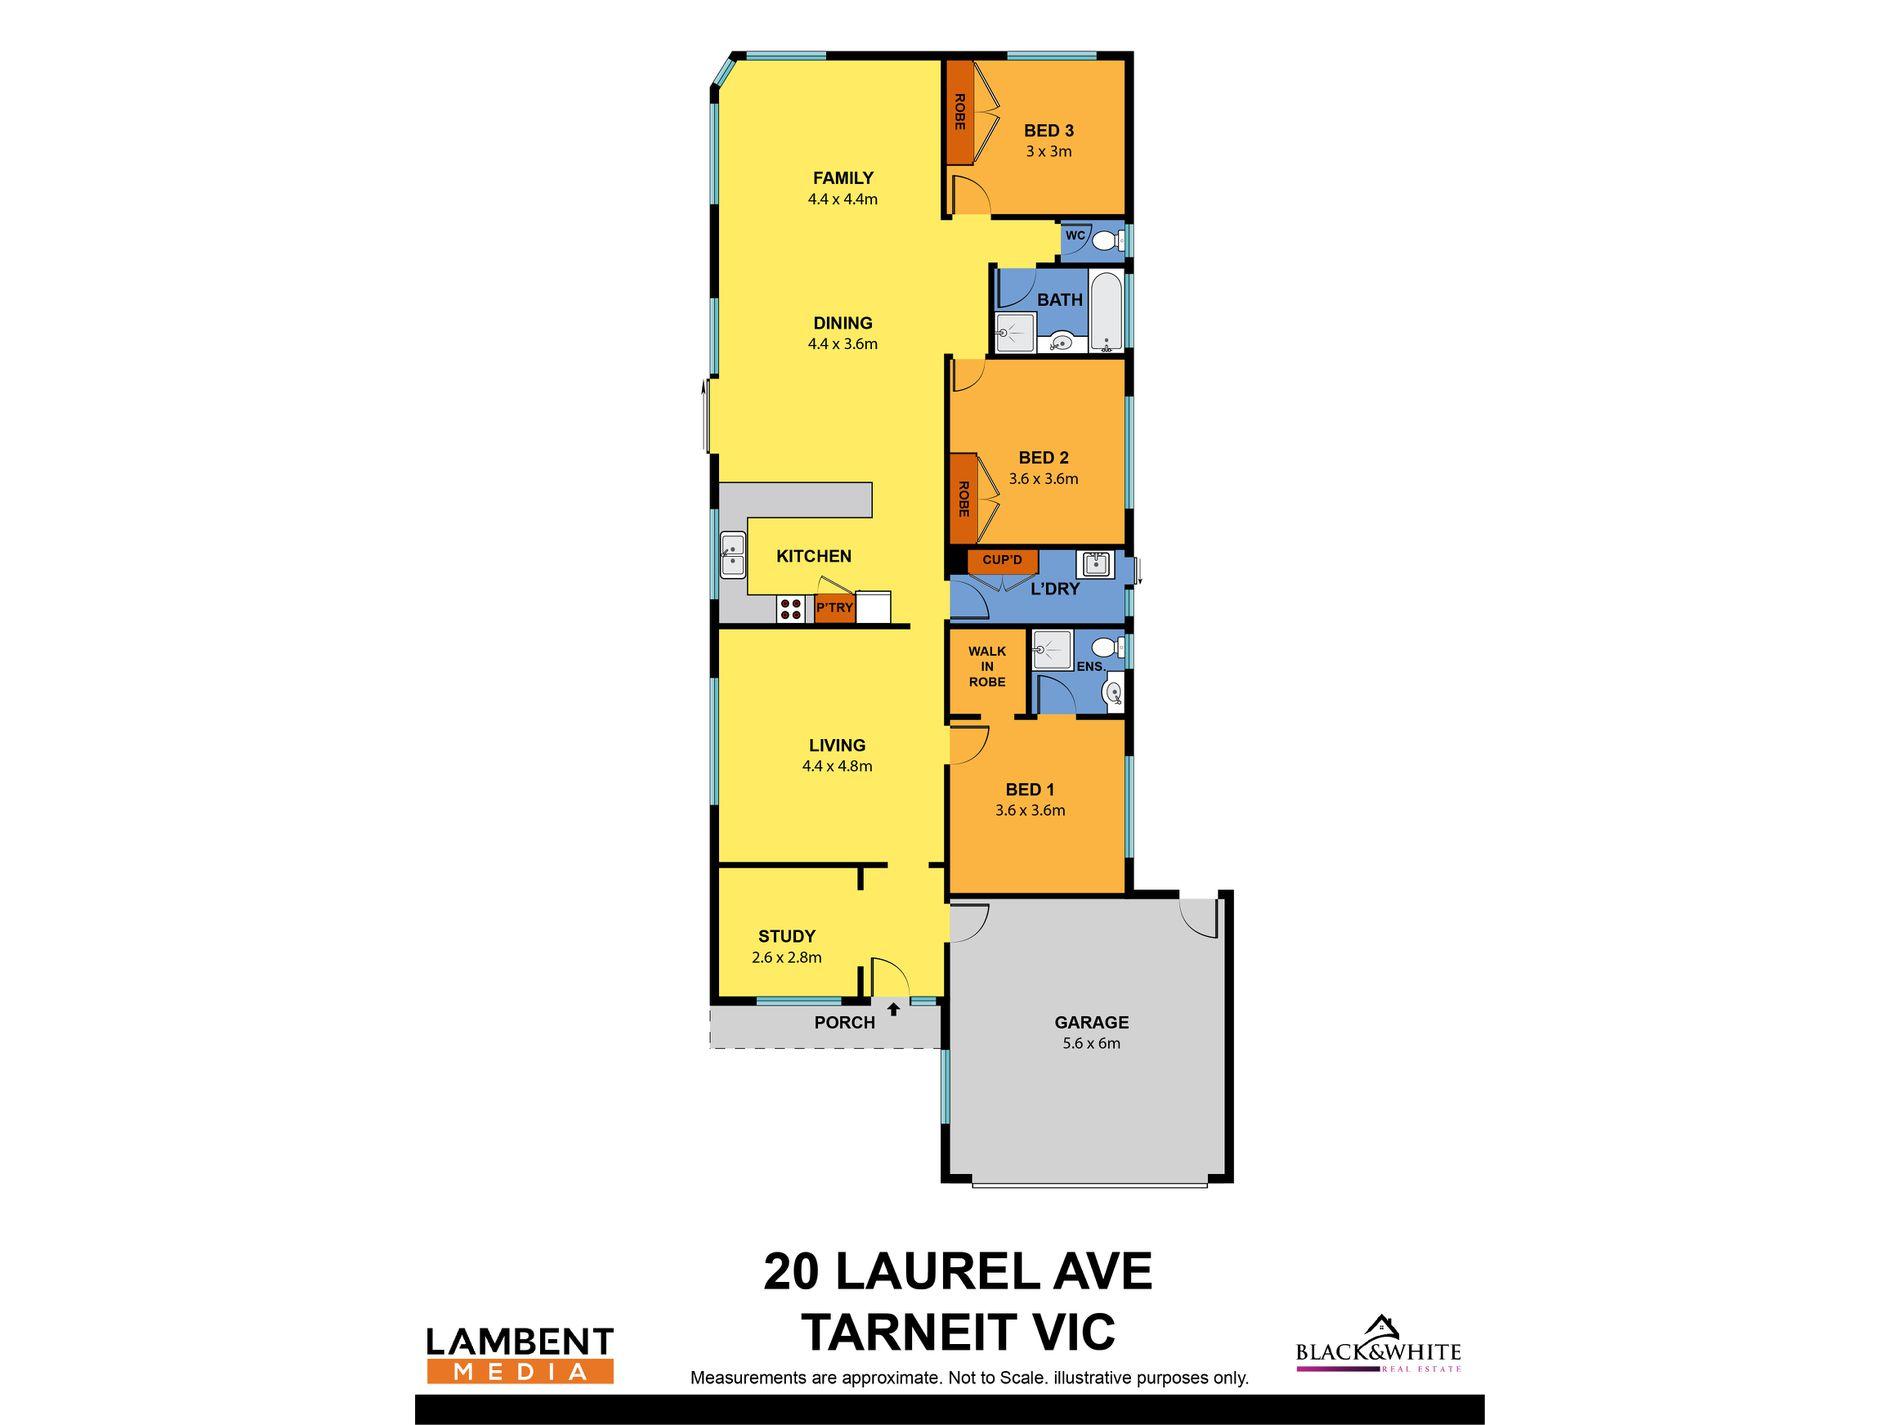 20 Laurel Avenue, Tarneit